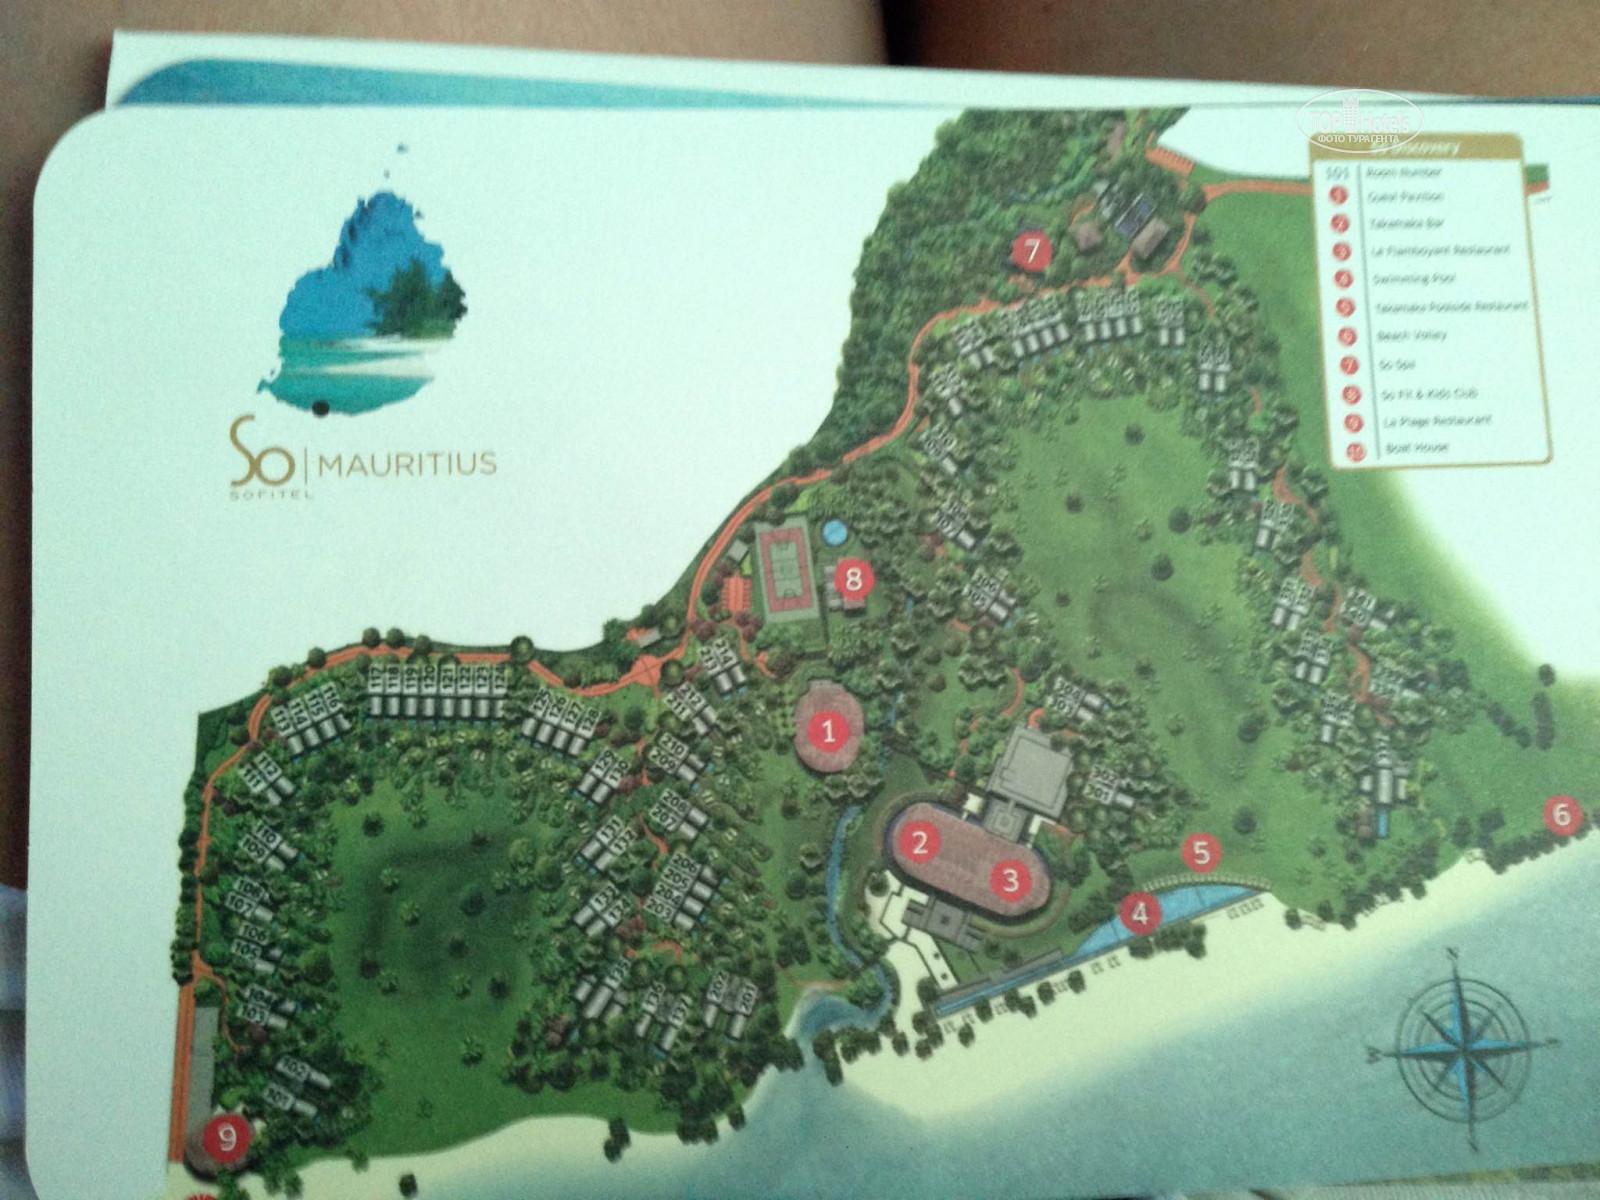 All photos Hotel map Sofitel So Mauritius Bel Ombre 5